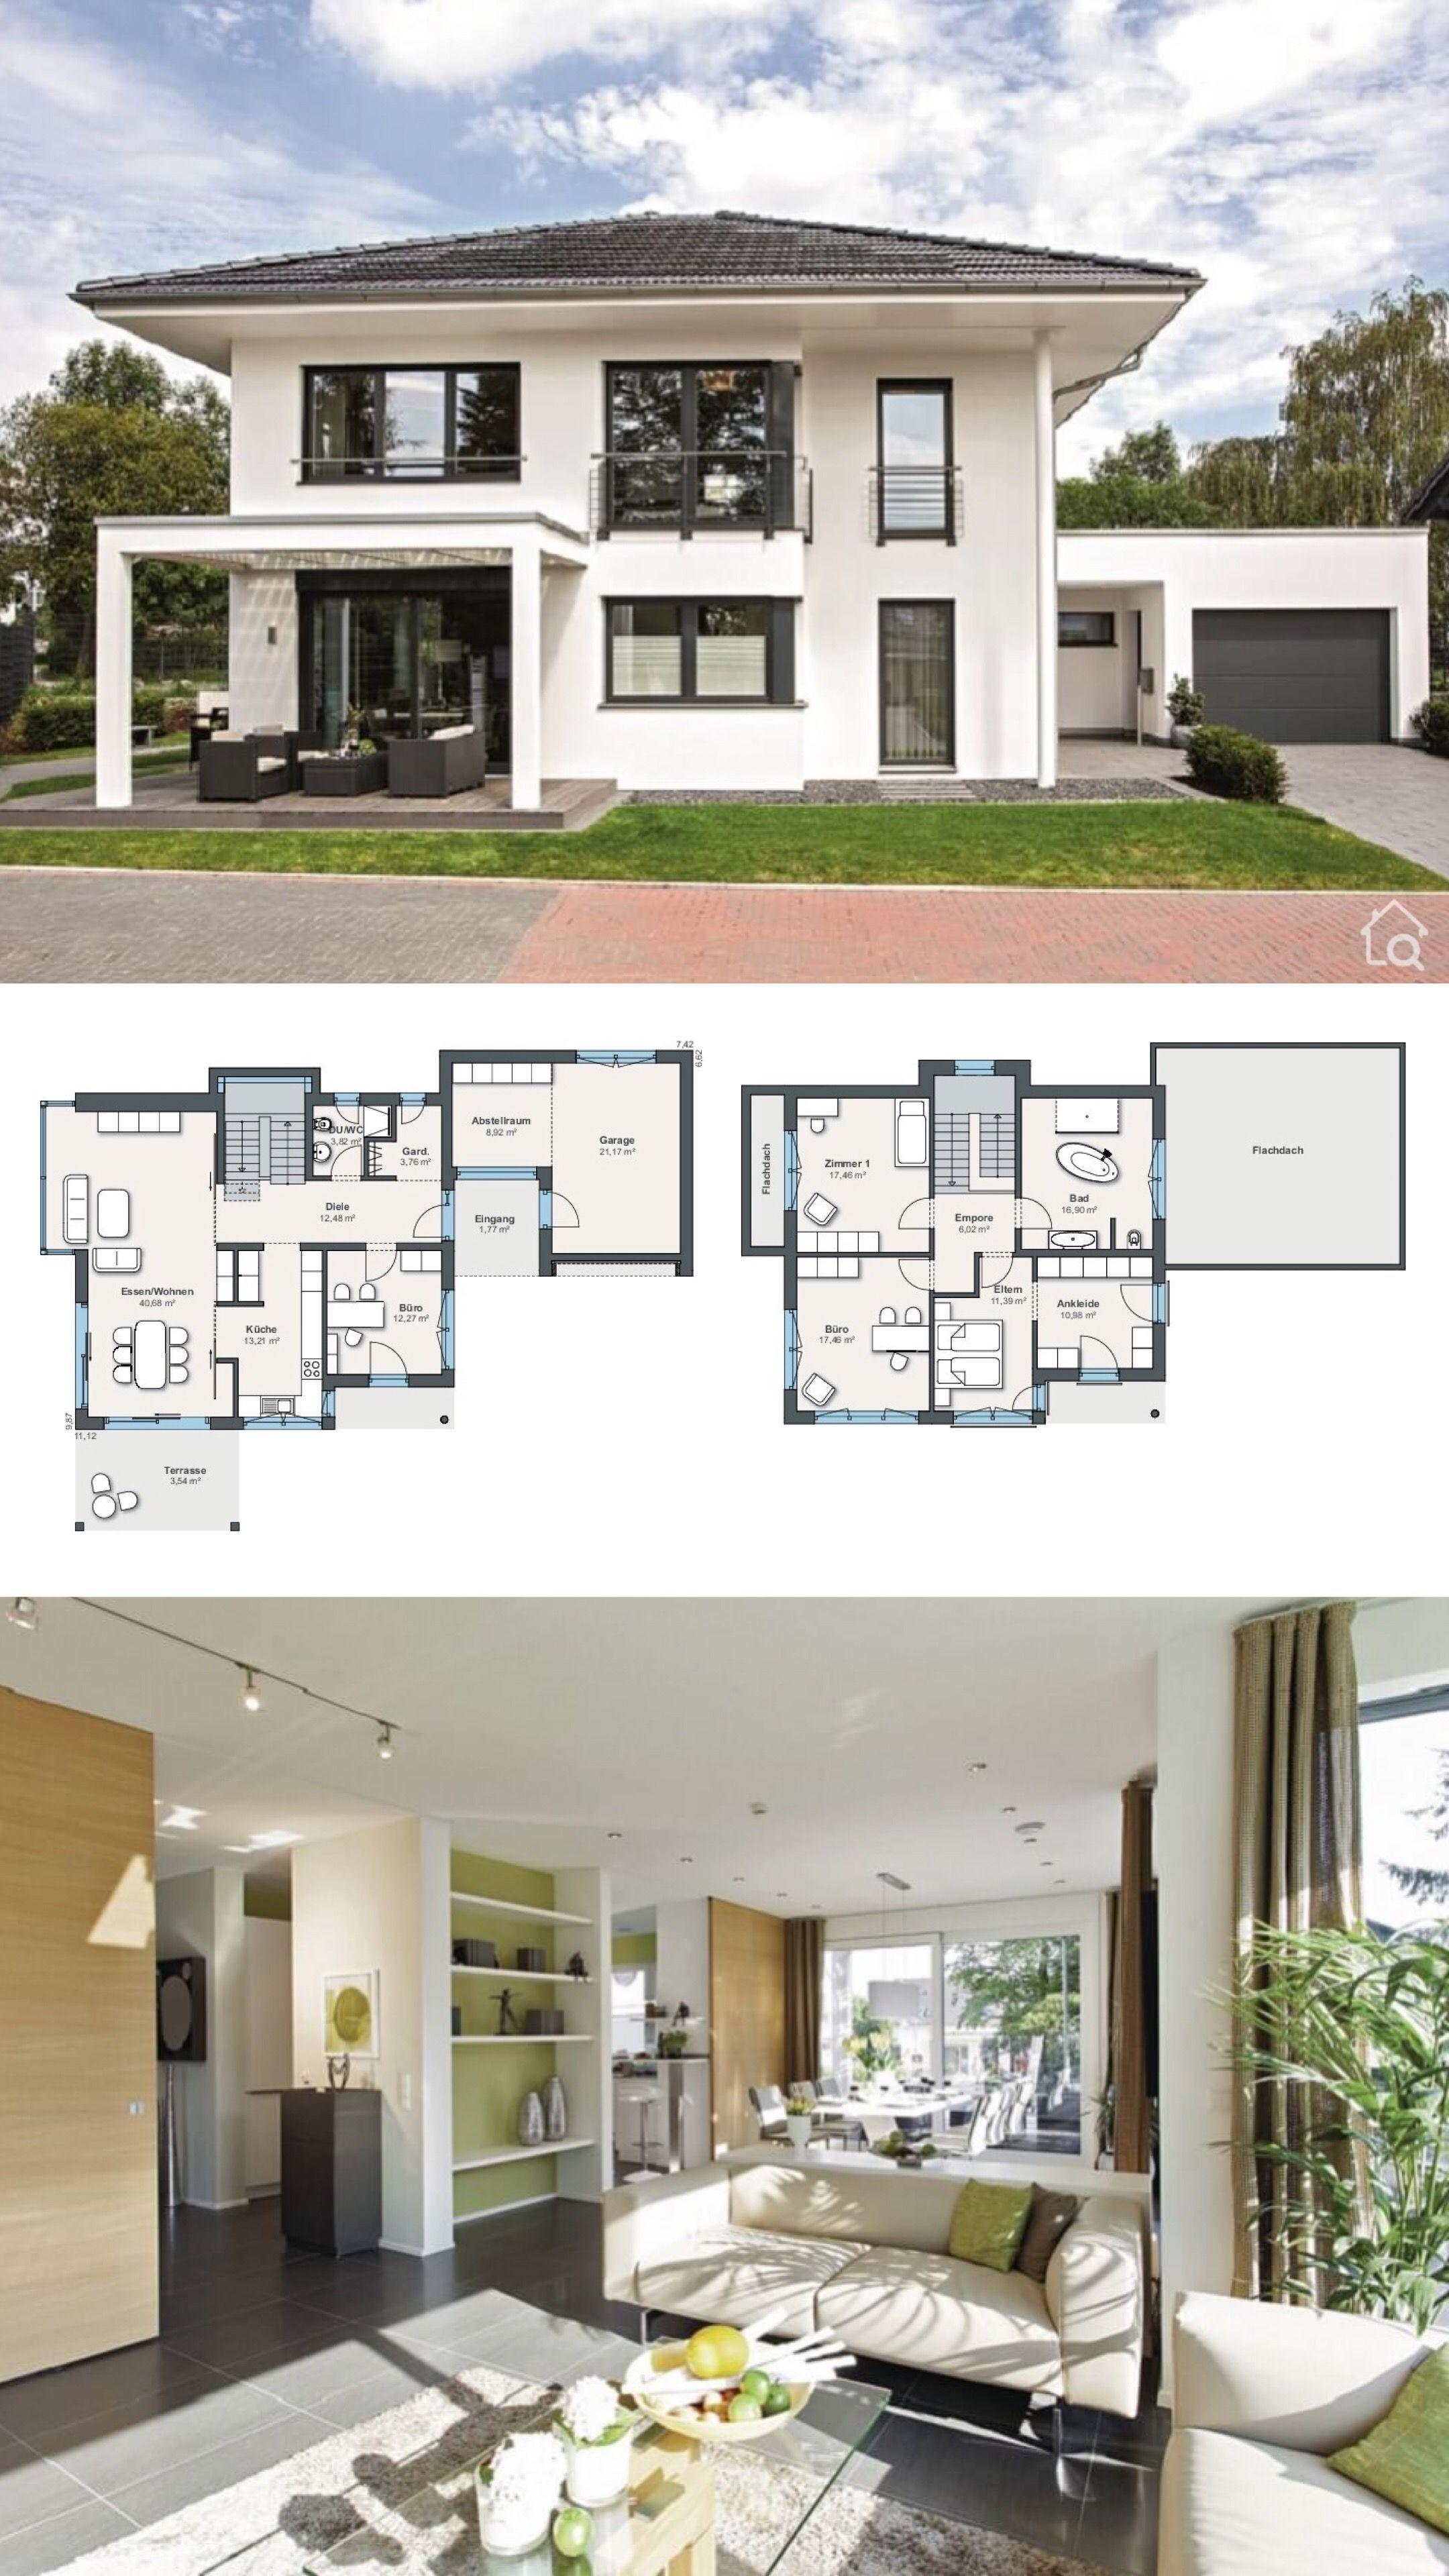 Stadtvilla City Life – Haus 250 mit Garage WeberHaus